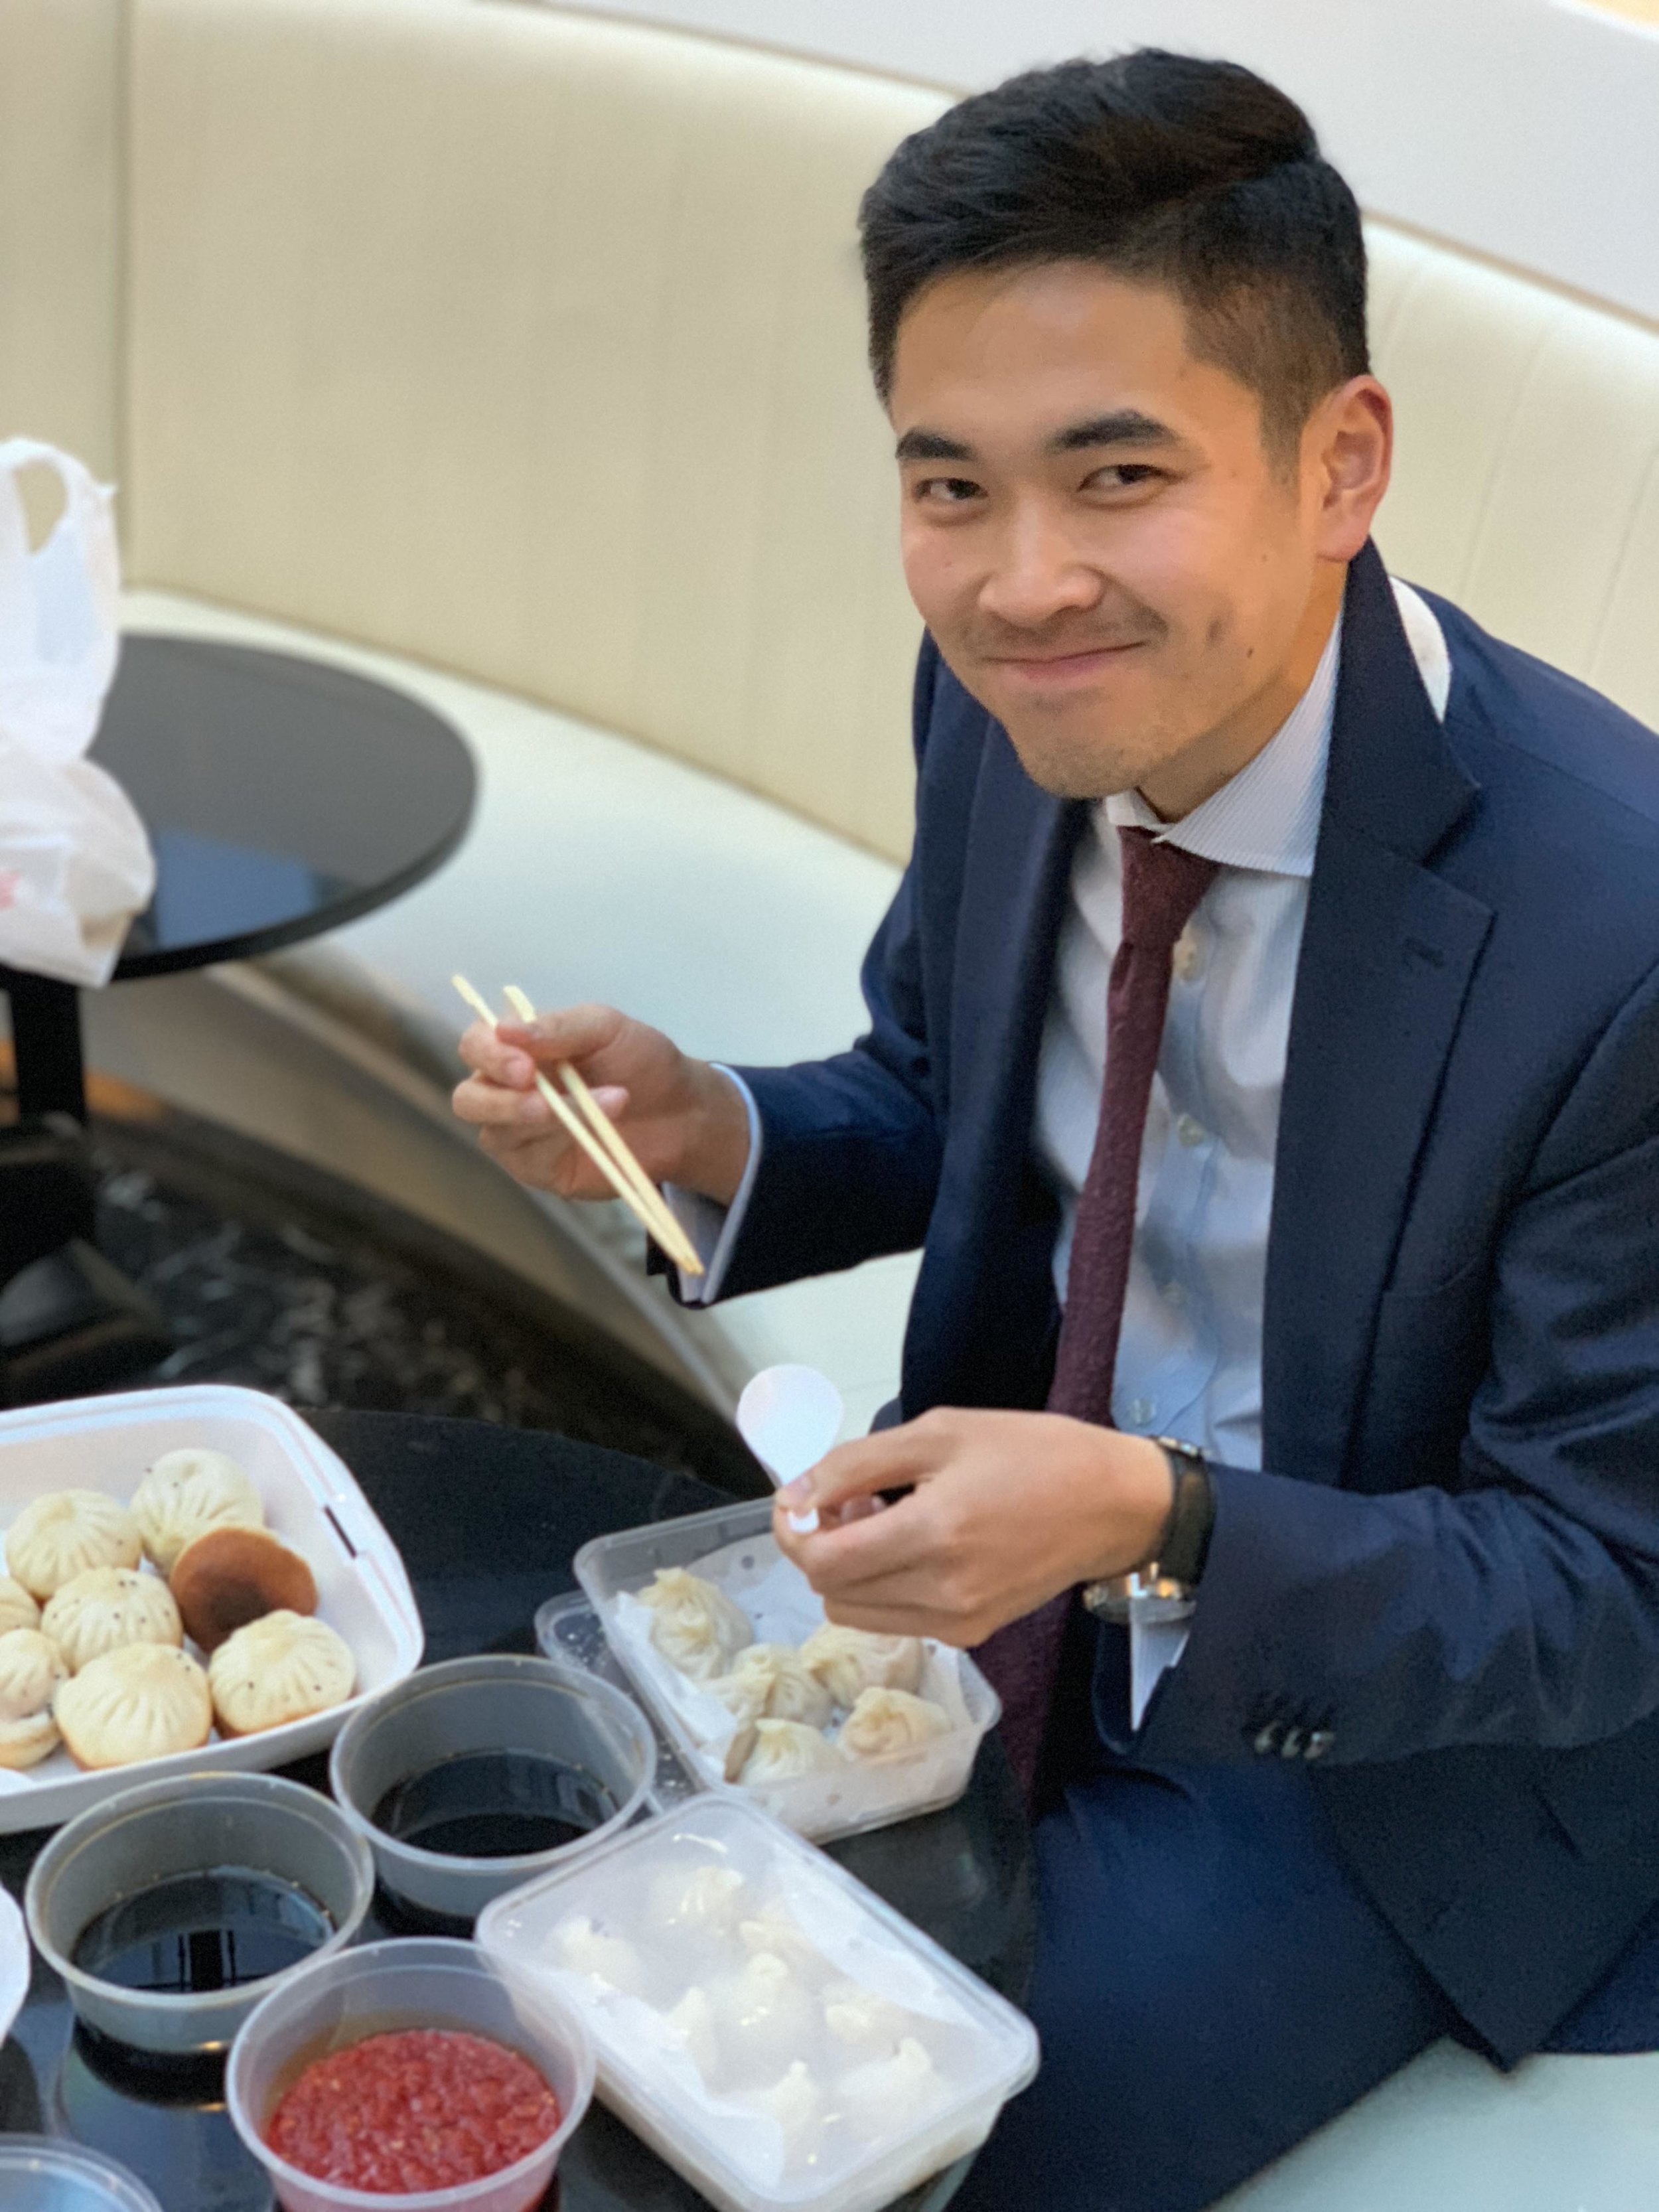 The ol' cheeky soup dumpling grin.